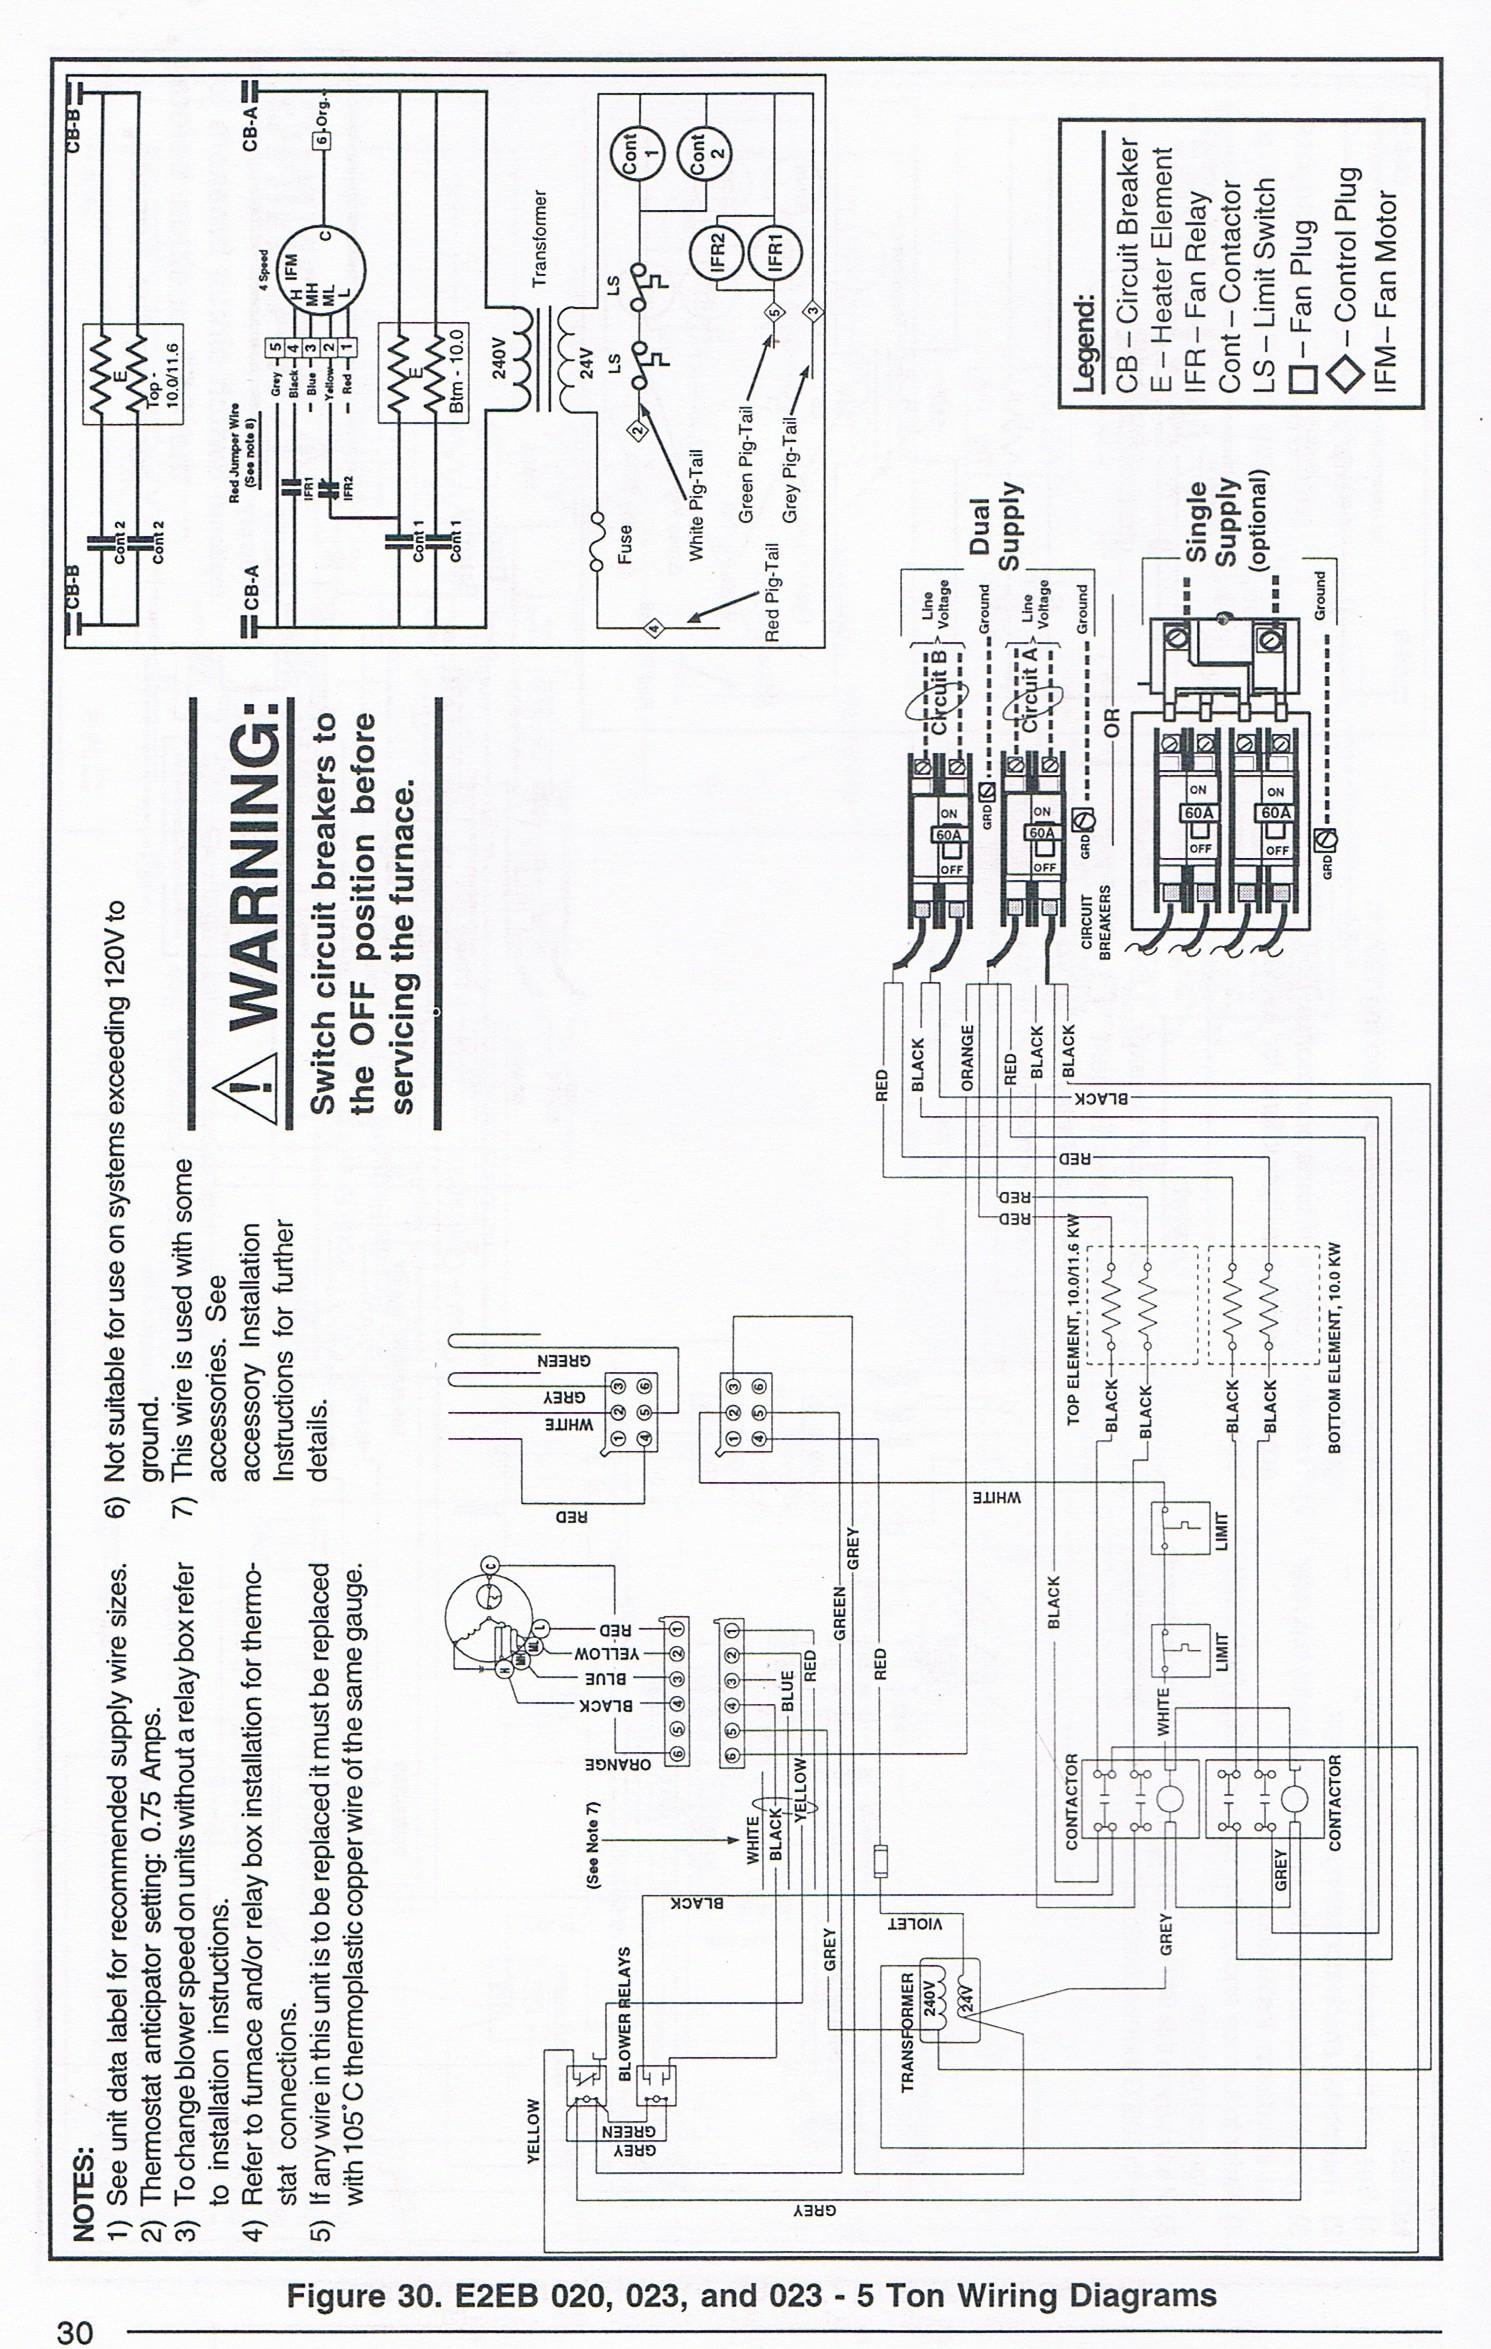 York Heat Pump Wiring Diagrams Readingrat Net In For Diagram Goodman - Electric Furnace Wiring Diagram